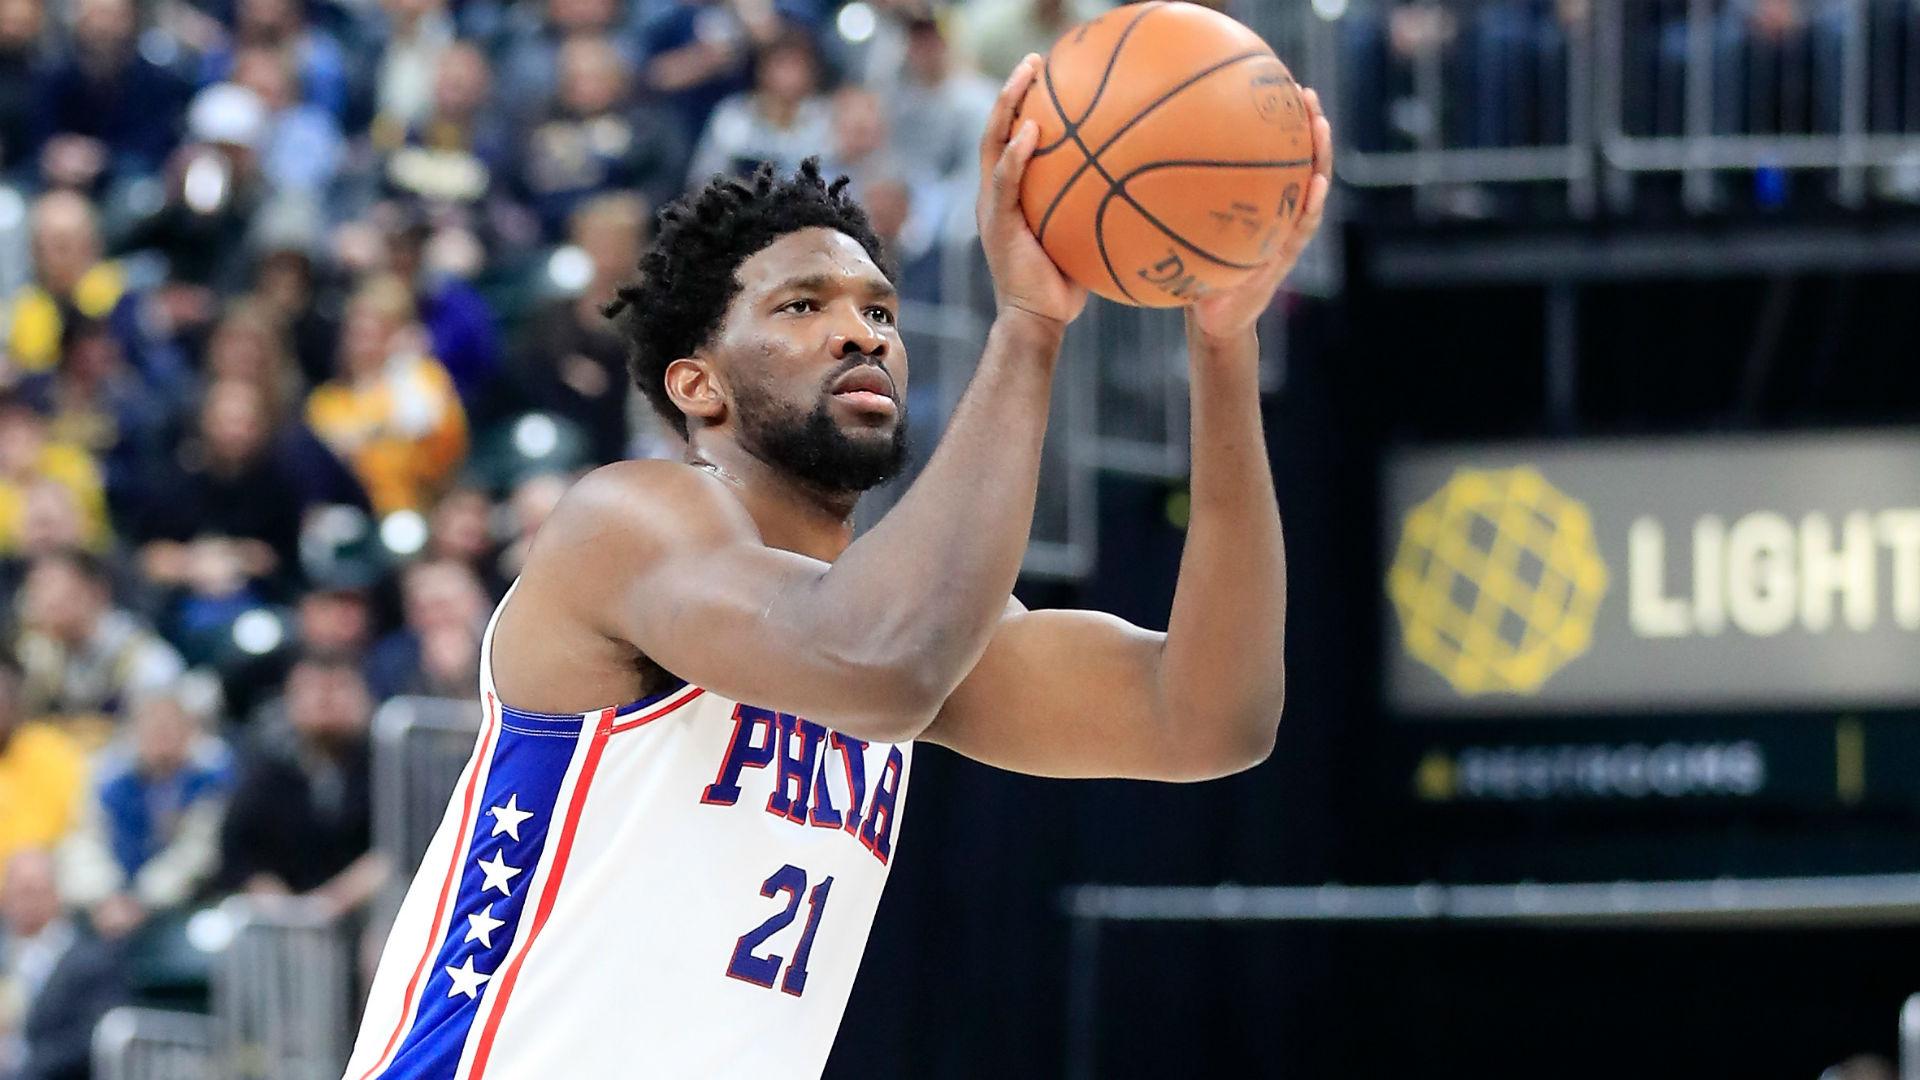 NBA wrap: 76ers hand Rockets largest loss of season; James Harden scores 37 points